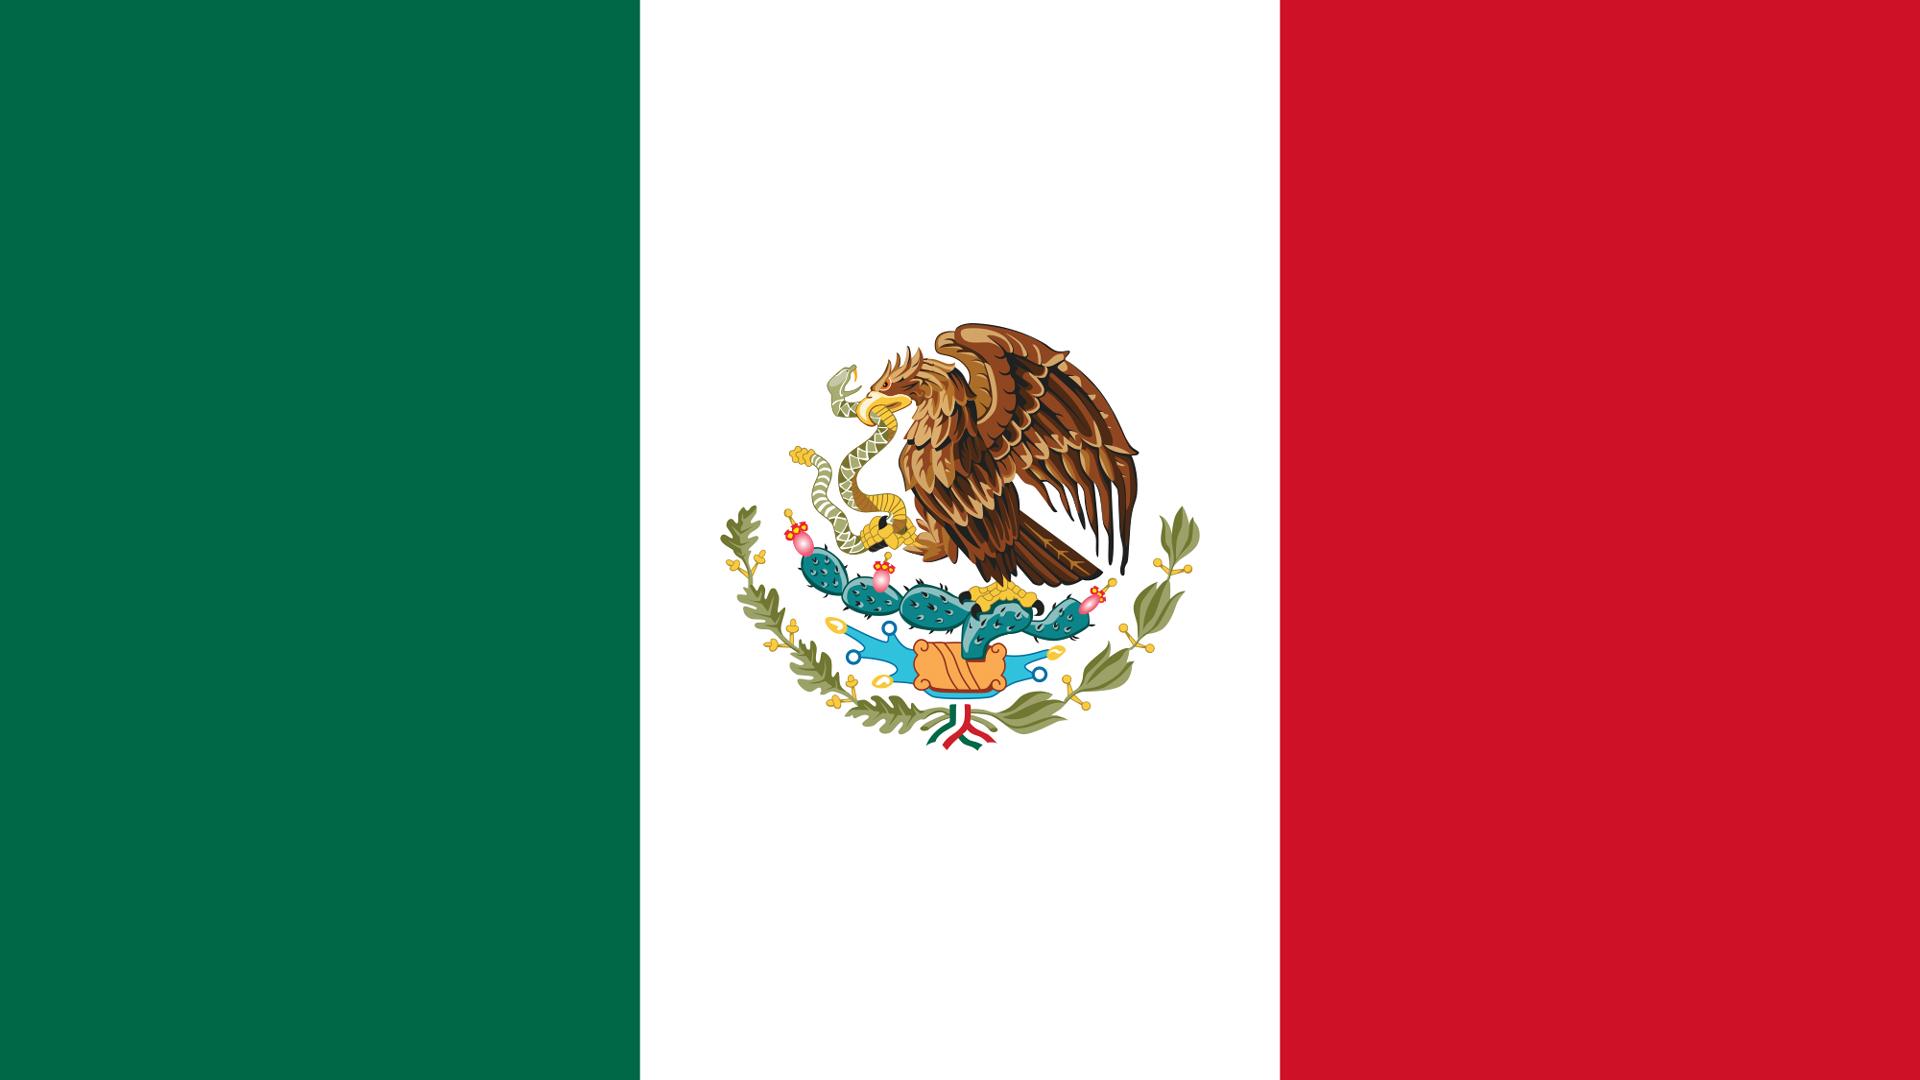 Флаг Мексики. История возникновения.